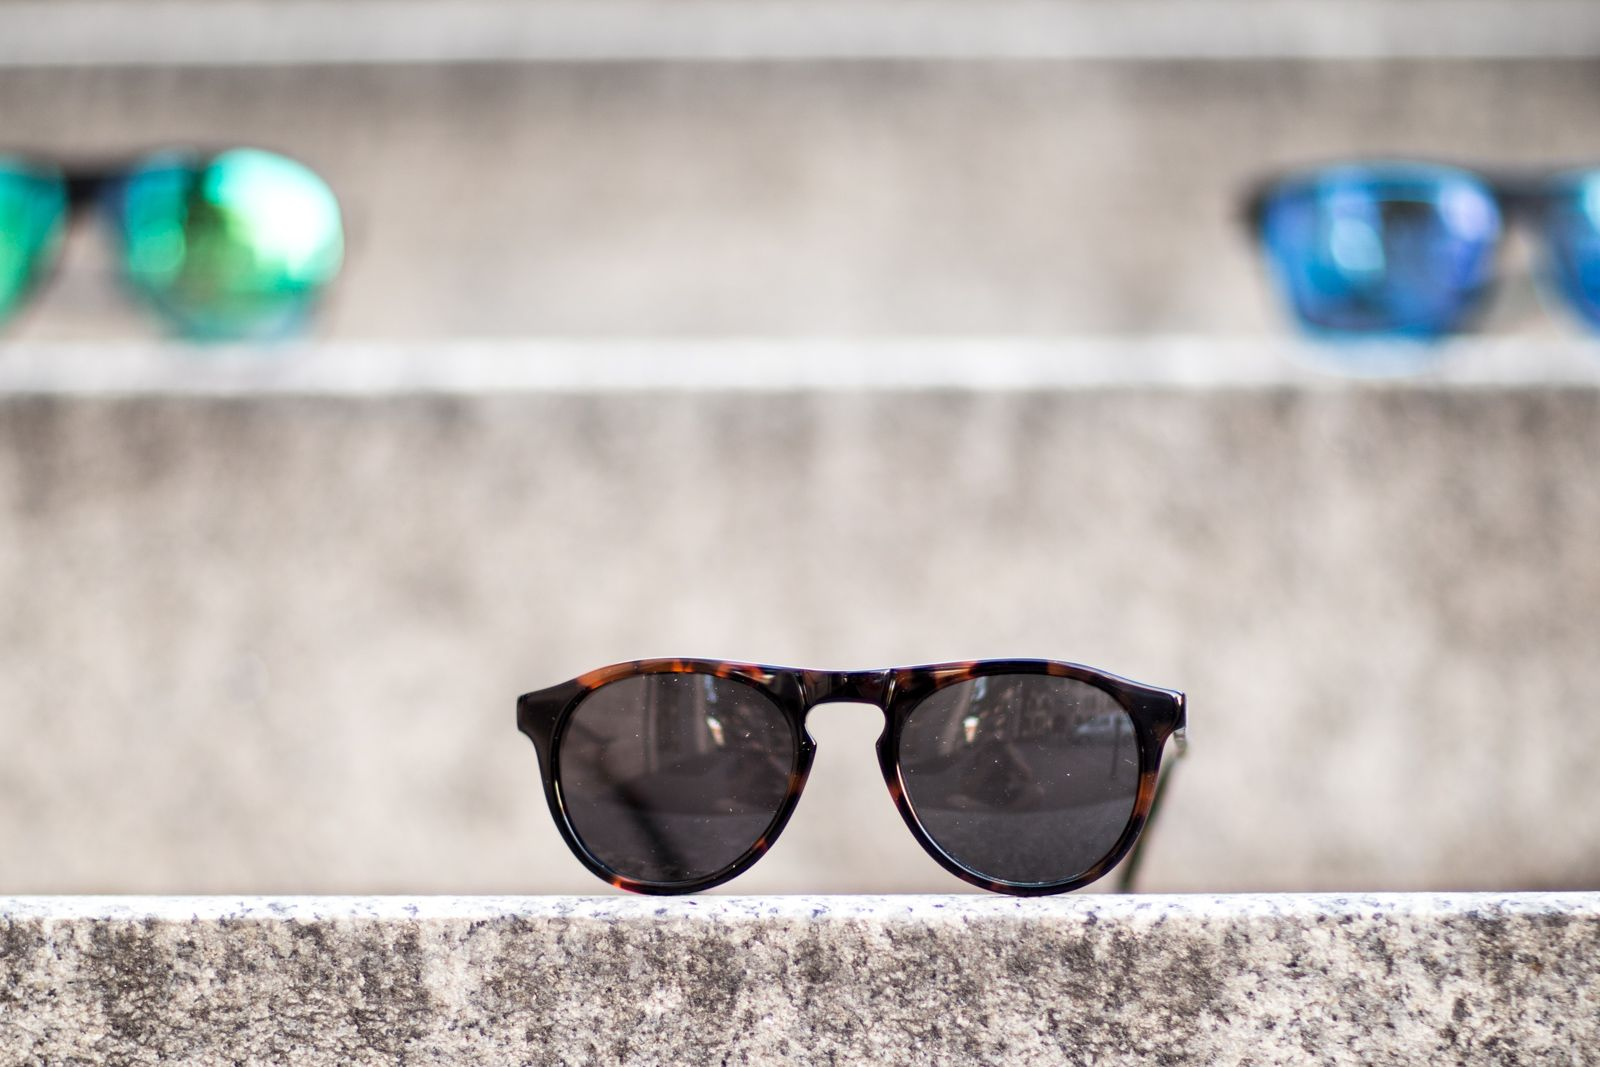 It's your choice! #sunglasses #eyewear #specs #glasses #fashion